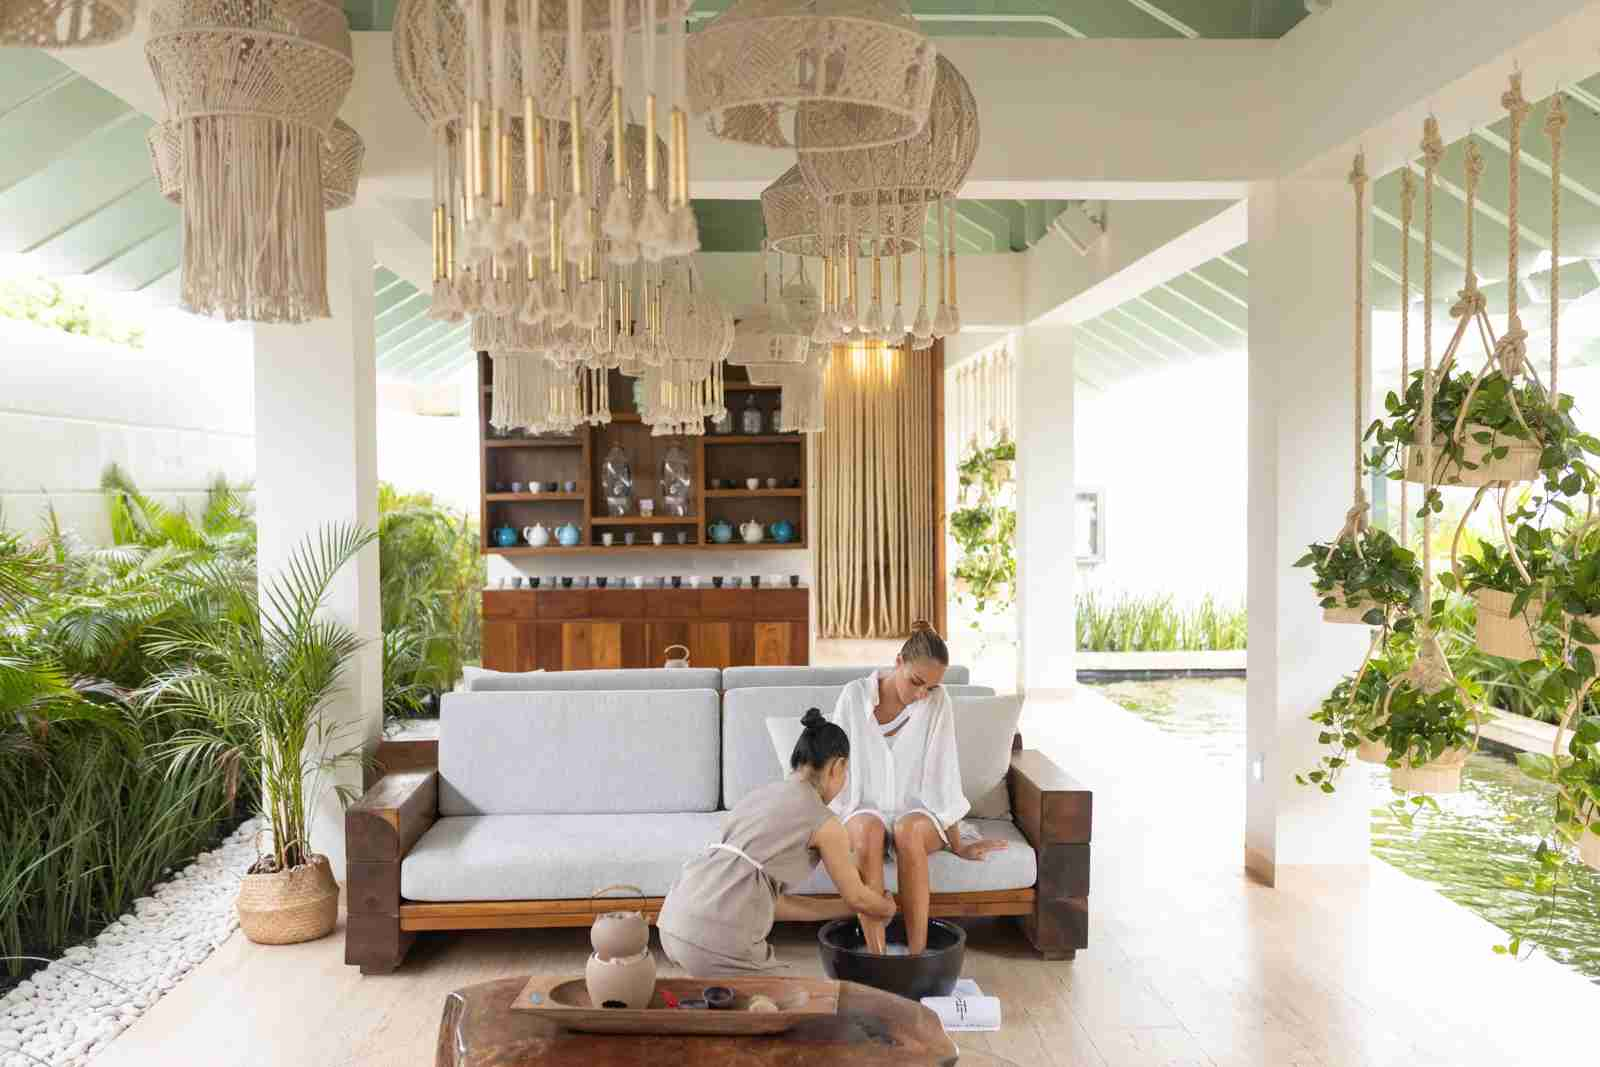 (Photo courtesy of the Meliá Hotels International)